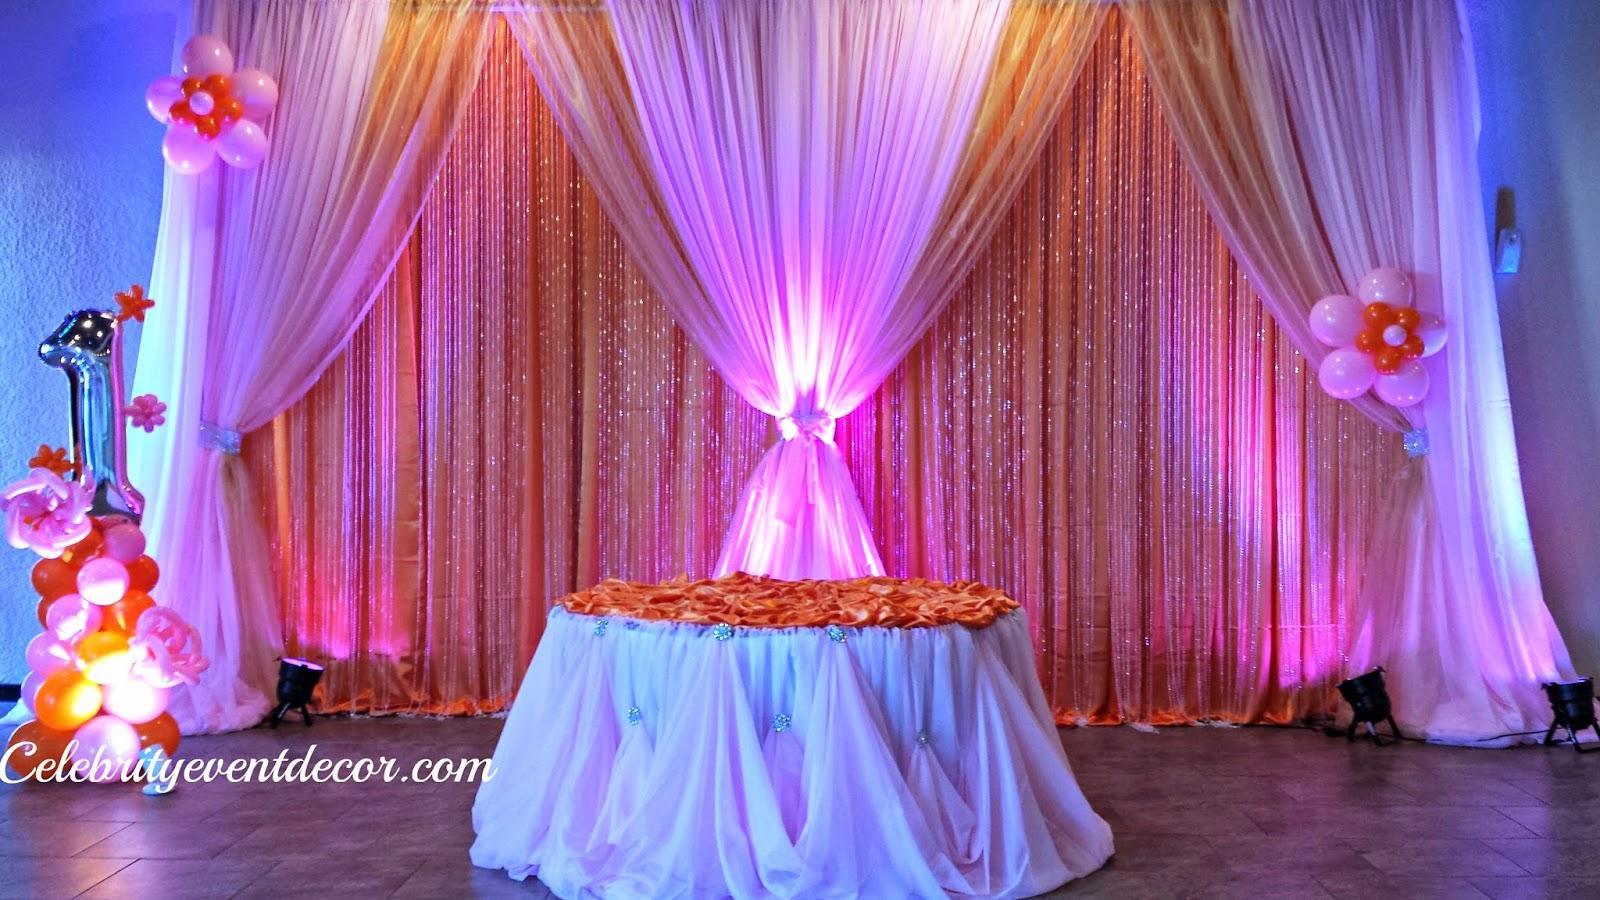 Celebrity Event Decor Banquet Hall LLC